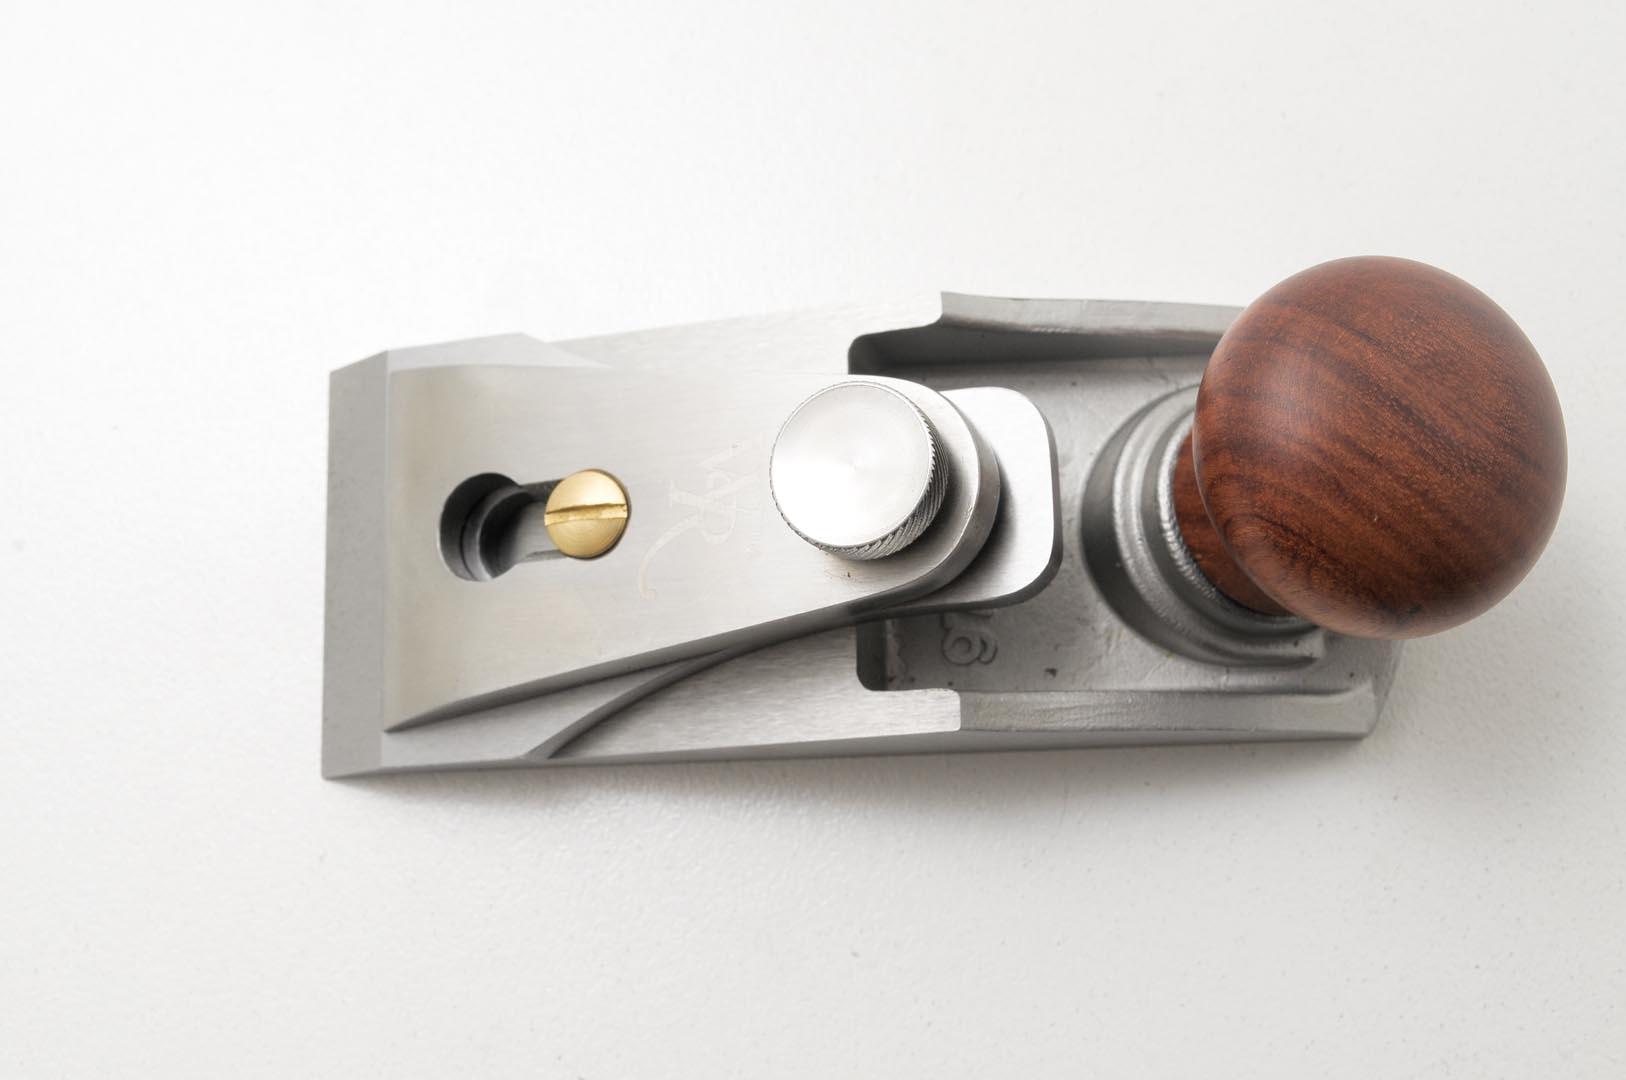 151301-Cepillo de formon pequeño WoodRiver 151301-max-4.